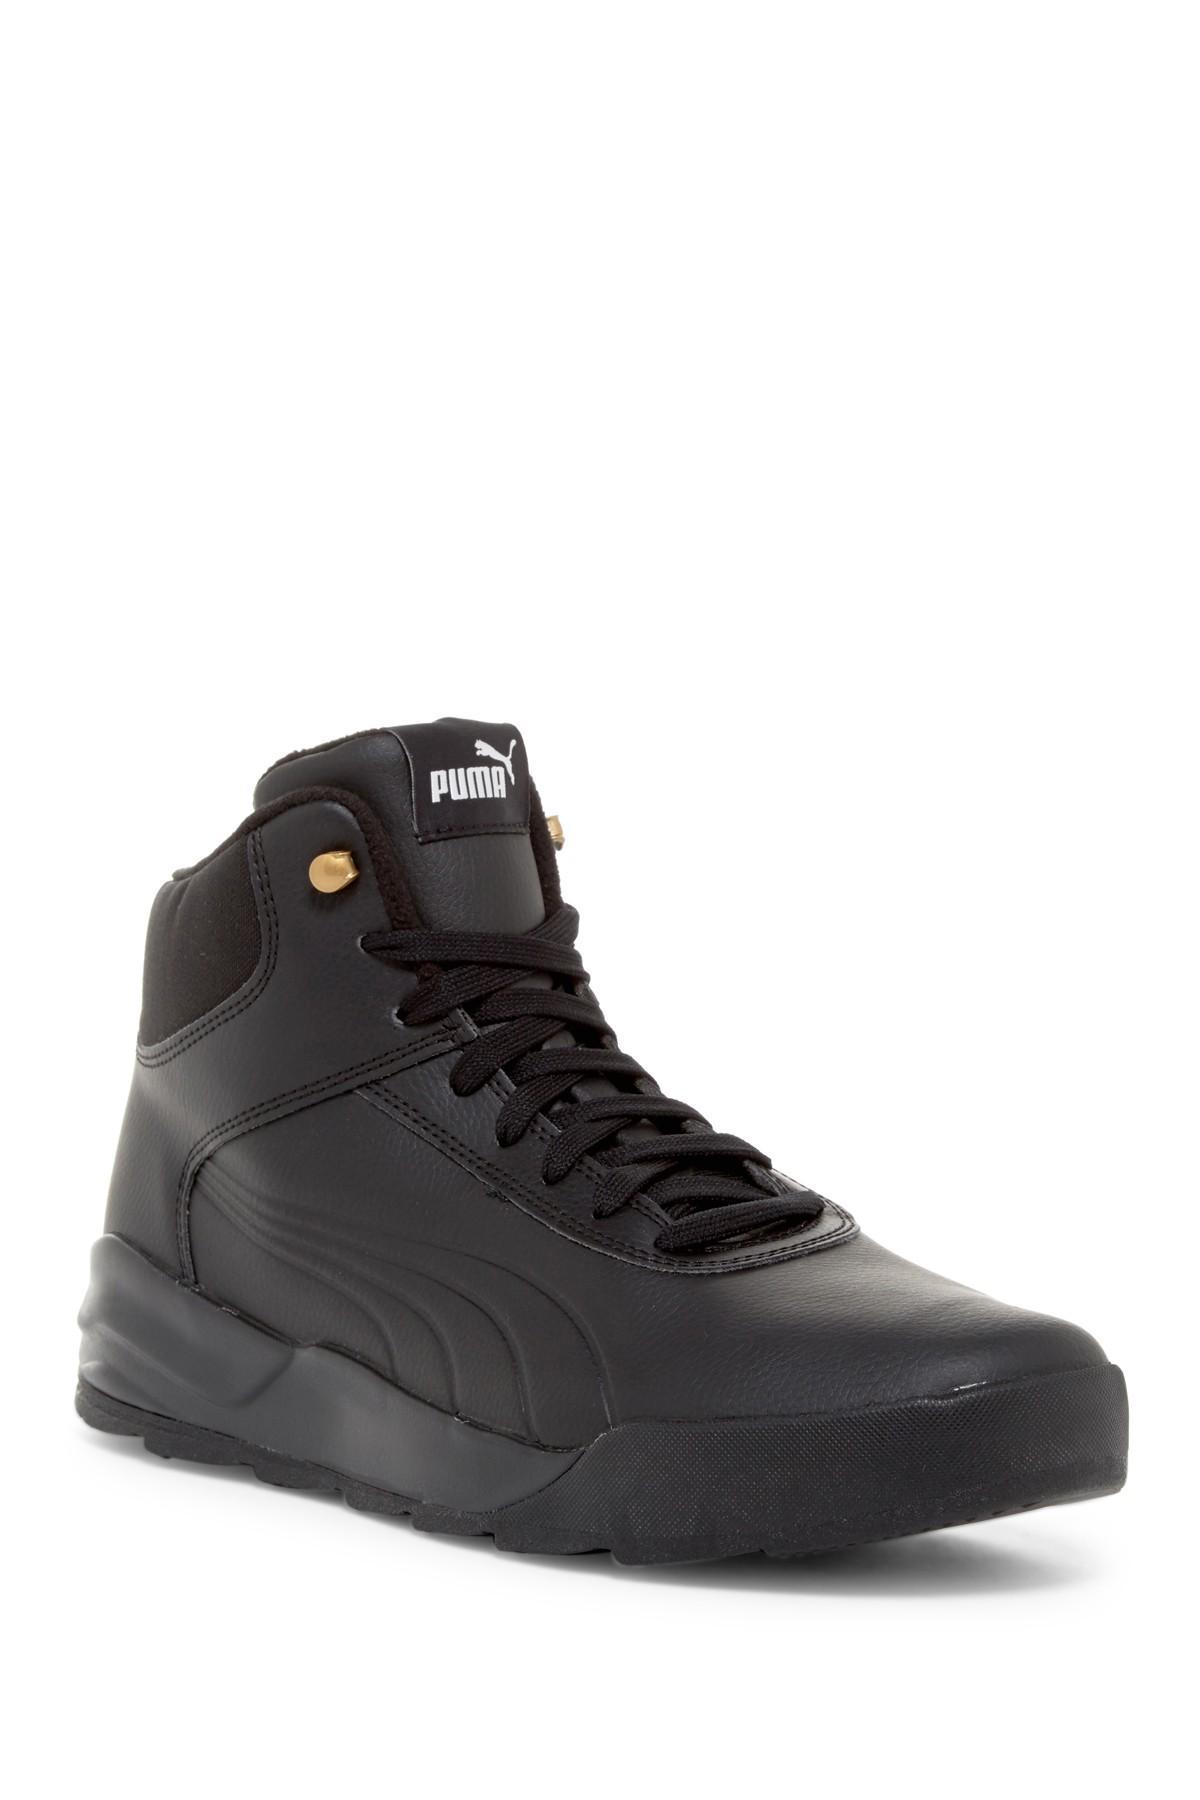 Nordstrom Rack Nike Running Shoes